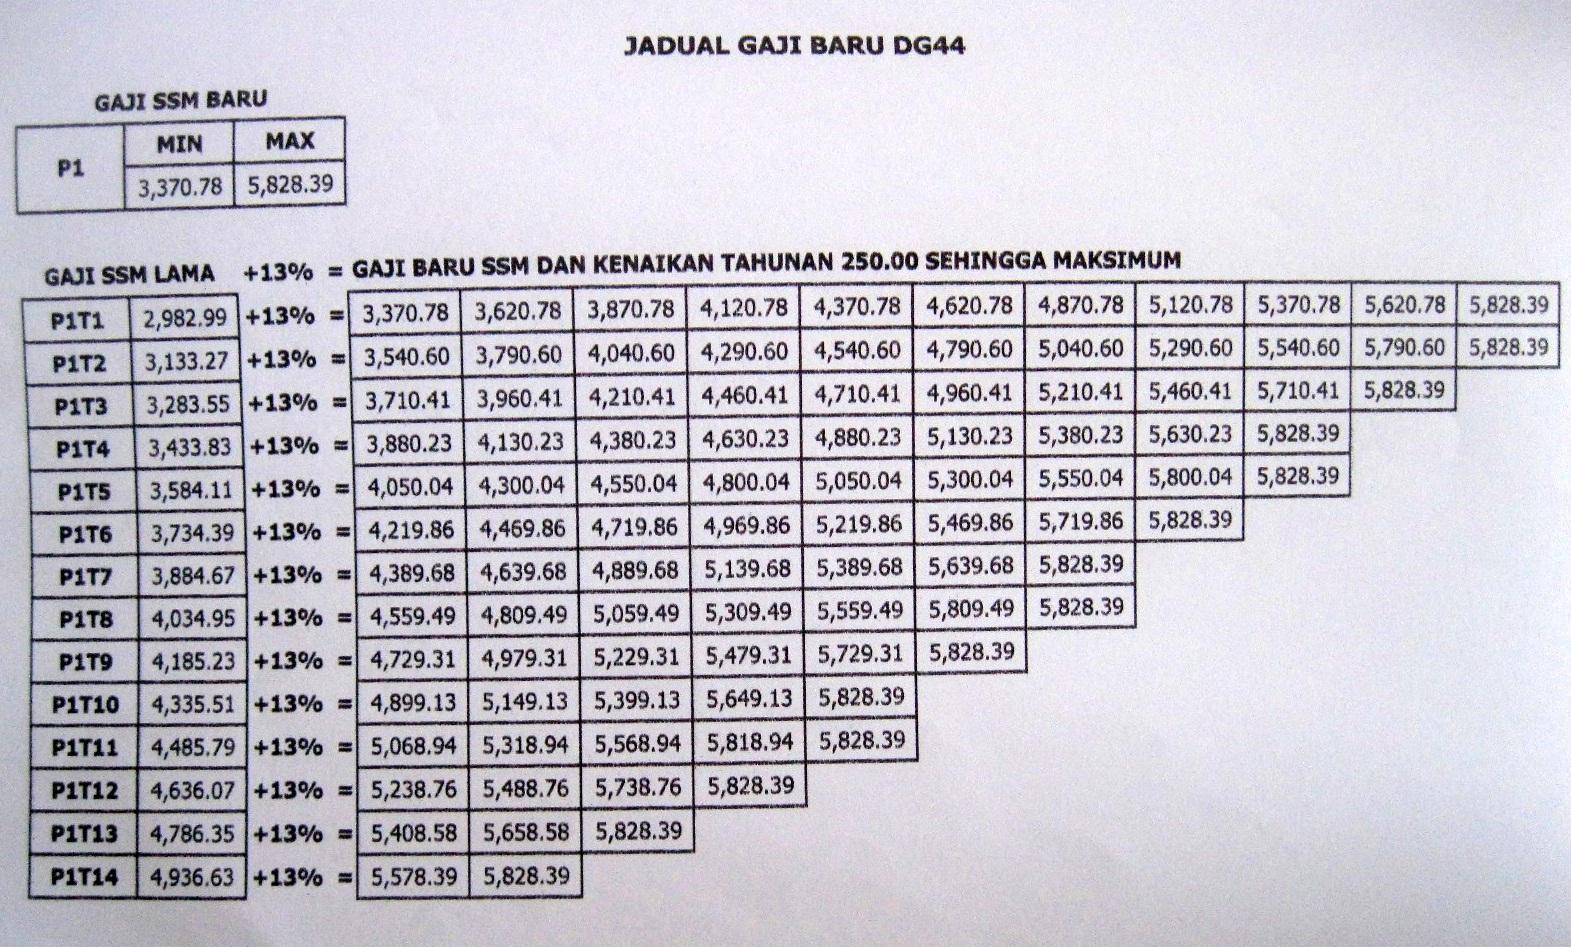 Jadual Gaji DG44 P1